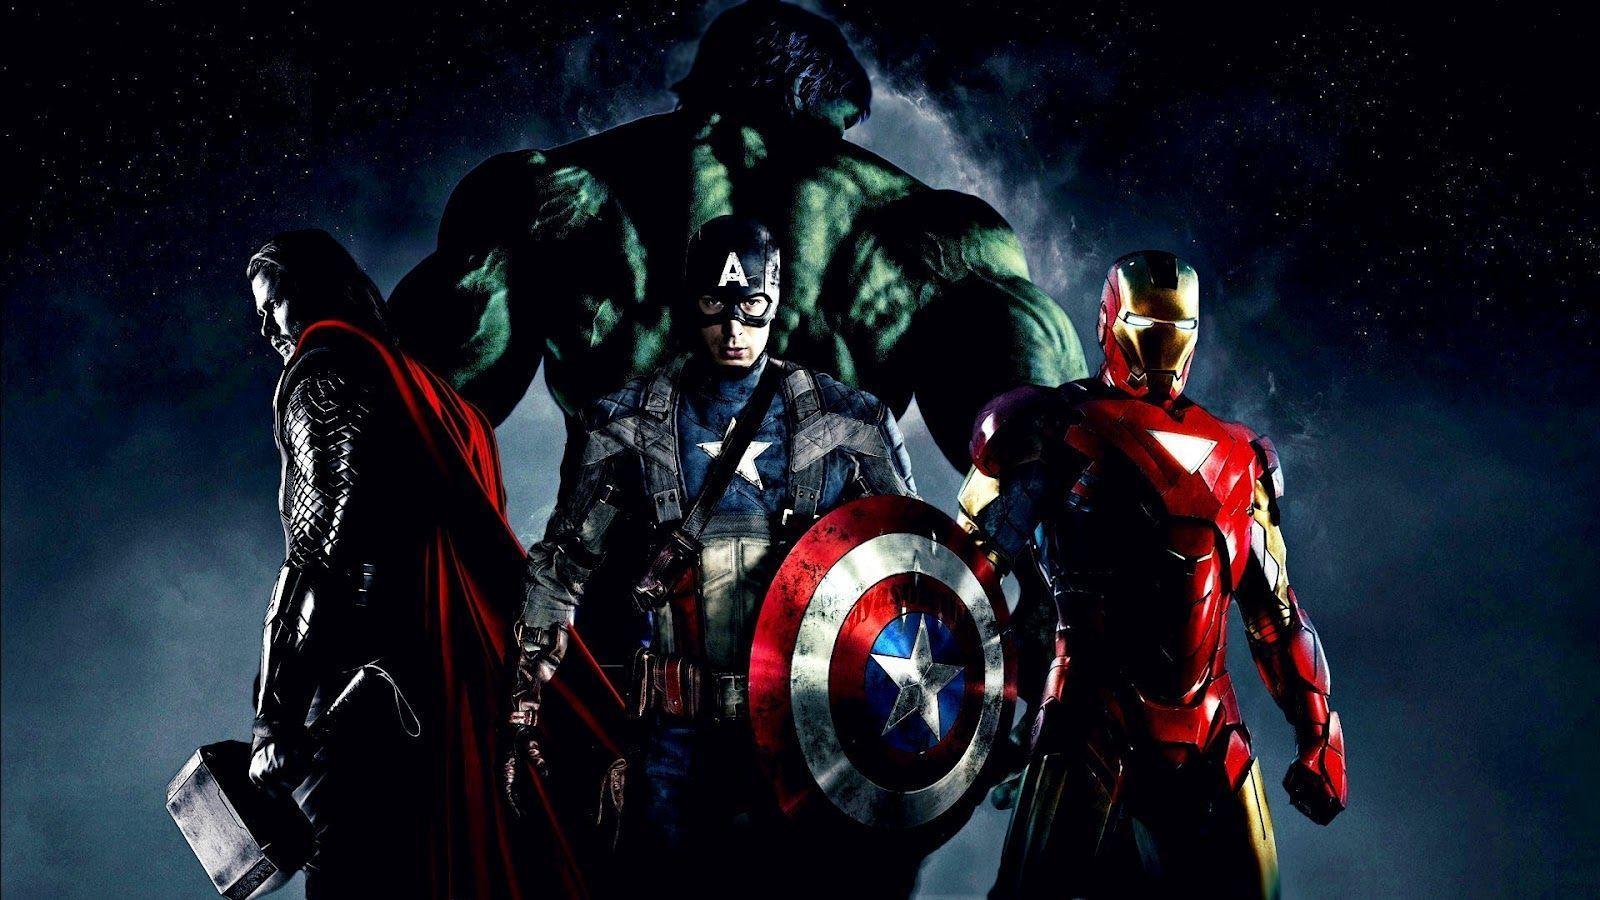 Iron Man Avengers Wallpapers Top Free Iron Man Avengers